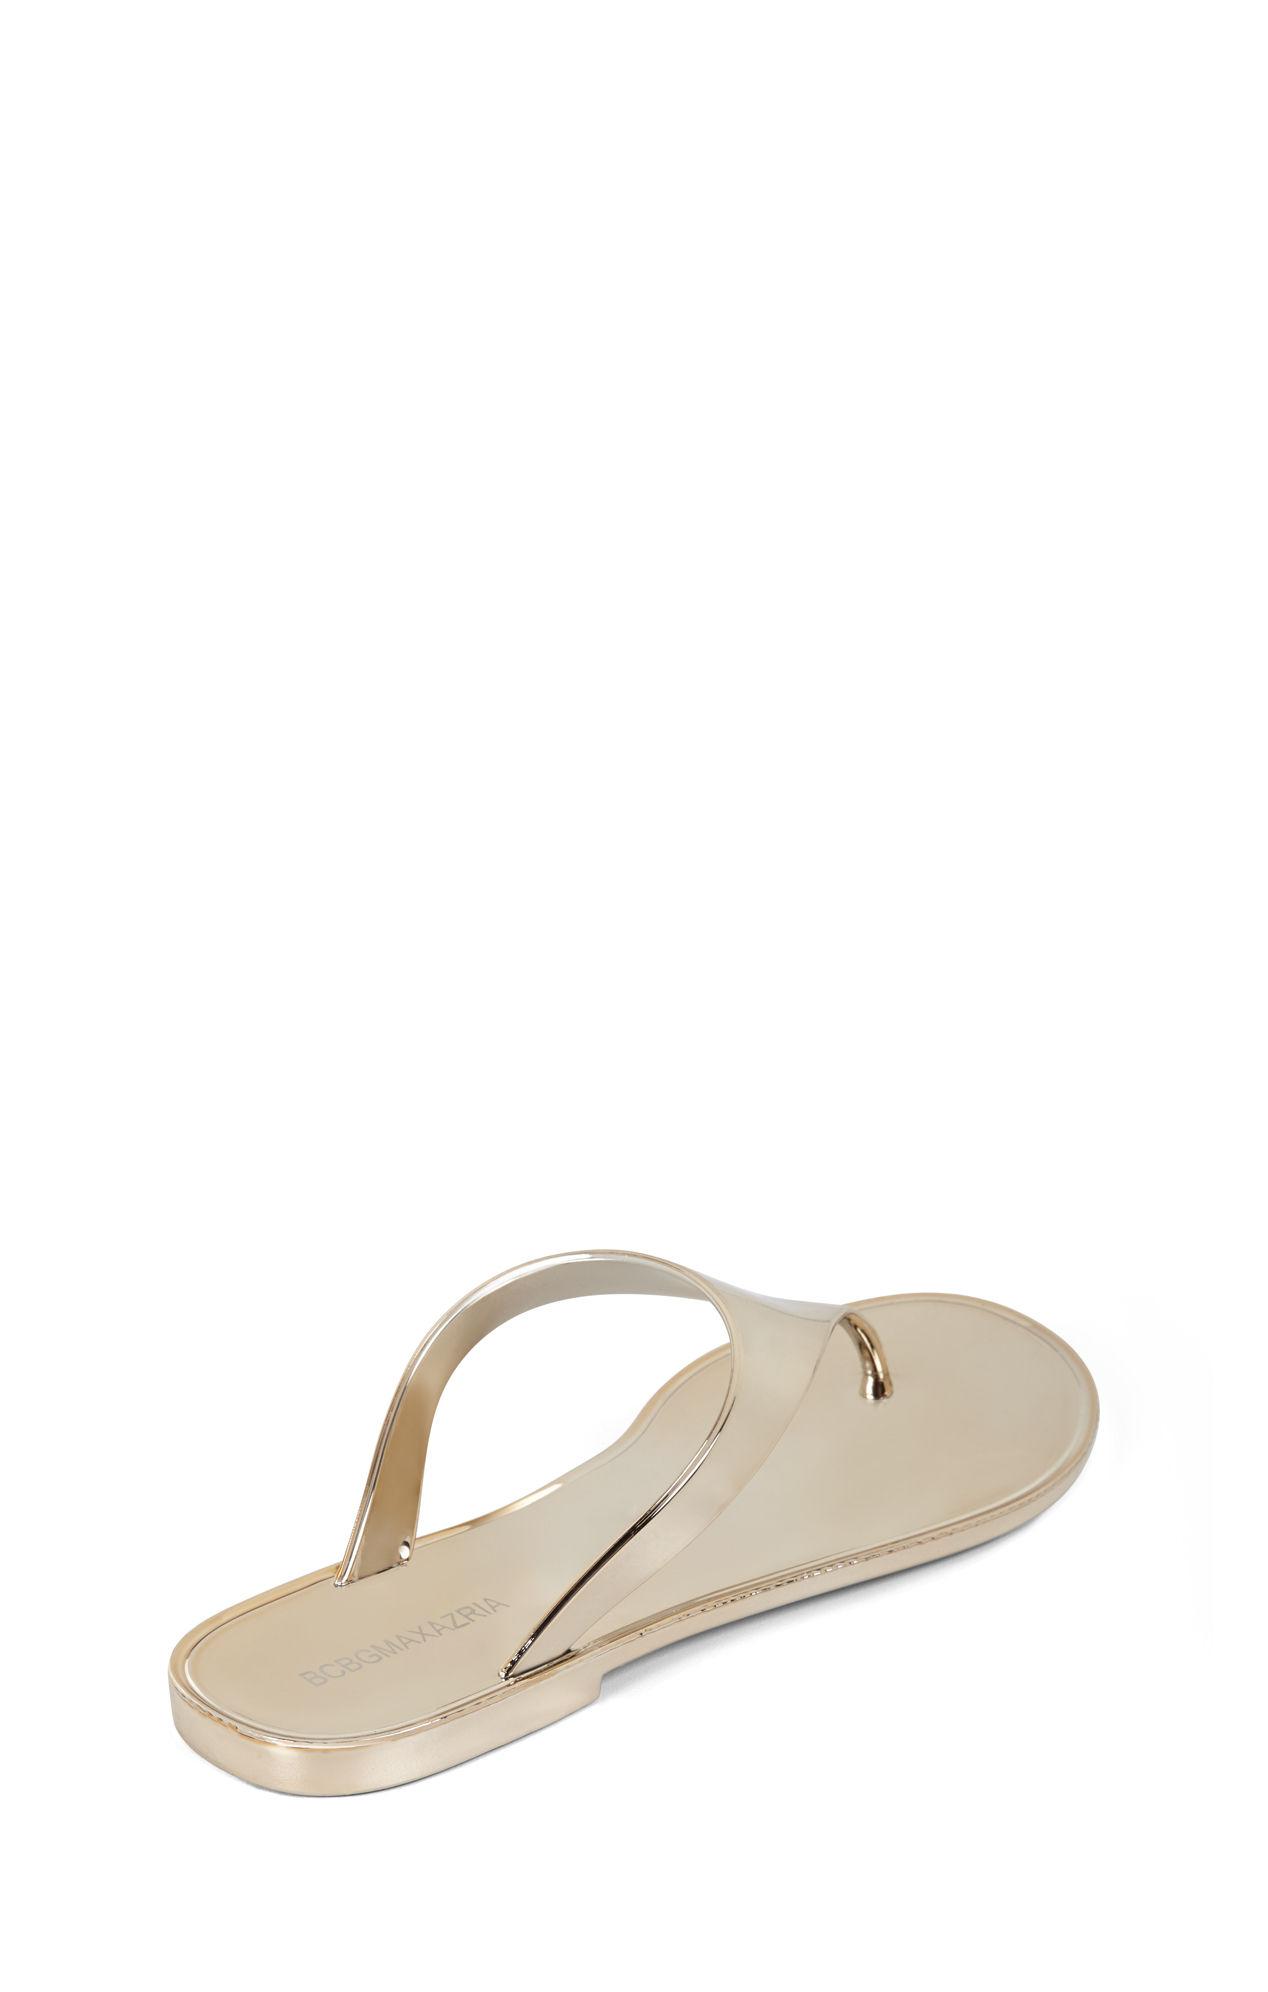 8a0427c06f7b Lyst bcbgmaxazria sabba metallic thong sandal in metallic jpg 1268x1992 Bcbg  gold sandals